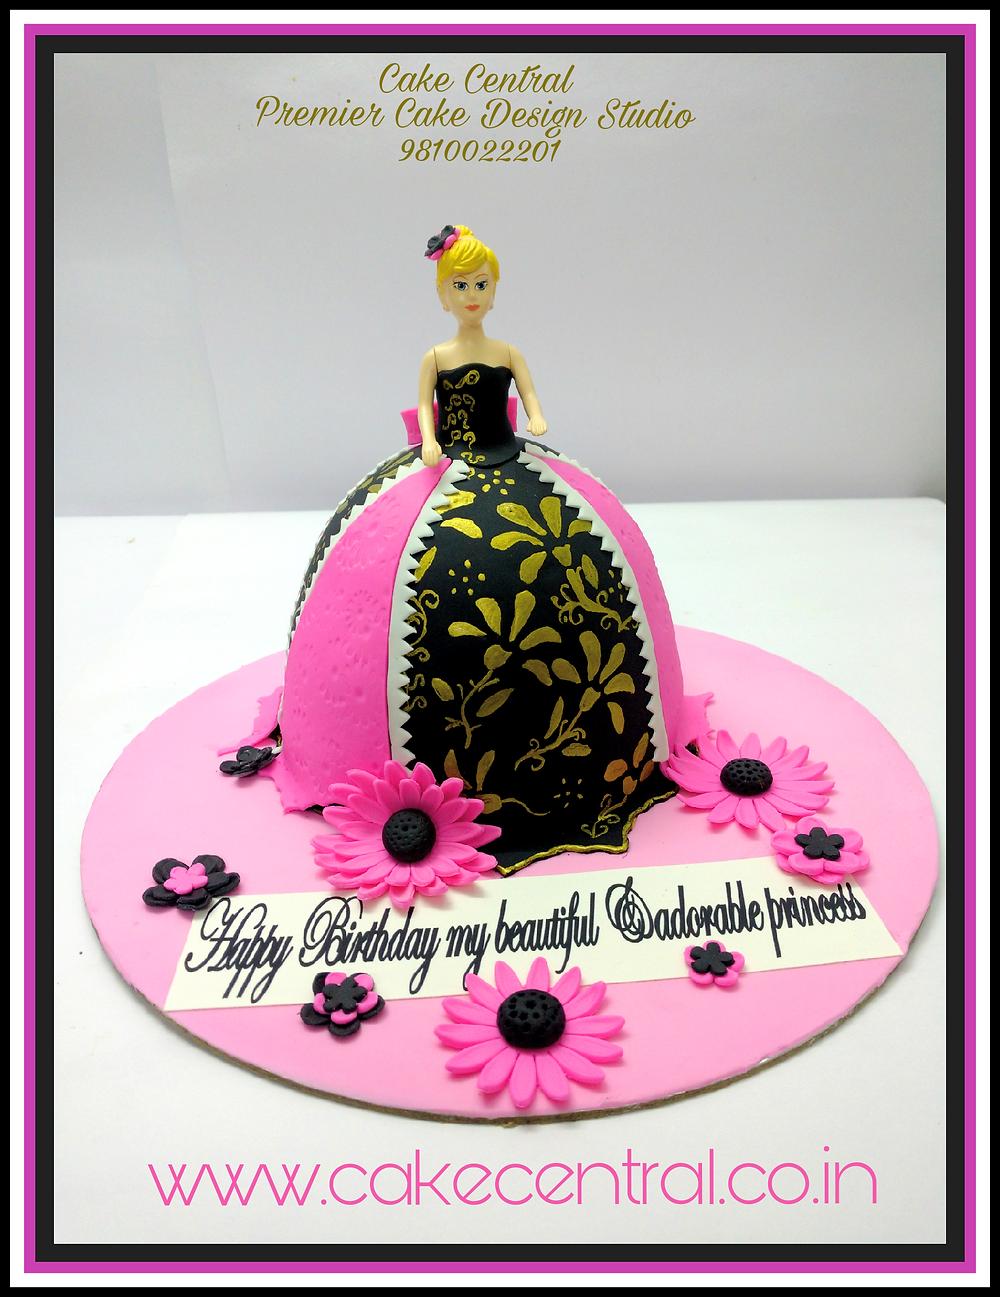 Barbie Doll Cake Delhi ,Doll Cake Delhi , Princess Cake Delhi , 4D Barbie Cake , Barbie Princess Theme Fondant Cake ,  3D Designer Barbie  Cake , Barbie Doll shaped Birthday Cake  -  Cake Central –Premier Cake Design Studio  Delhi  . New Delhi .